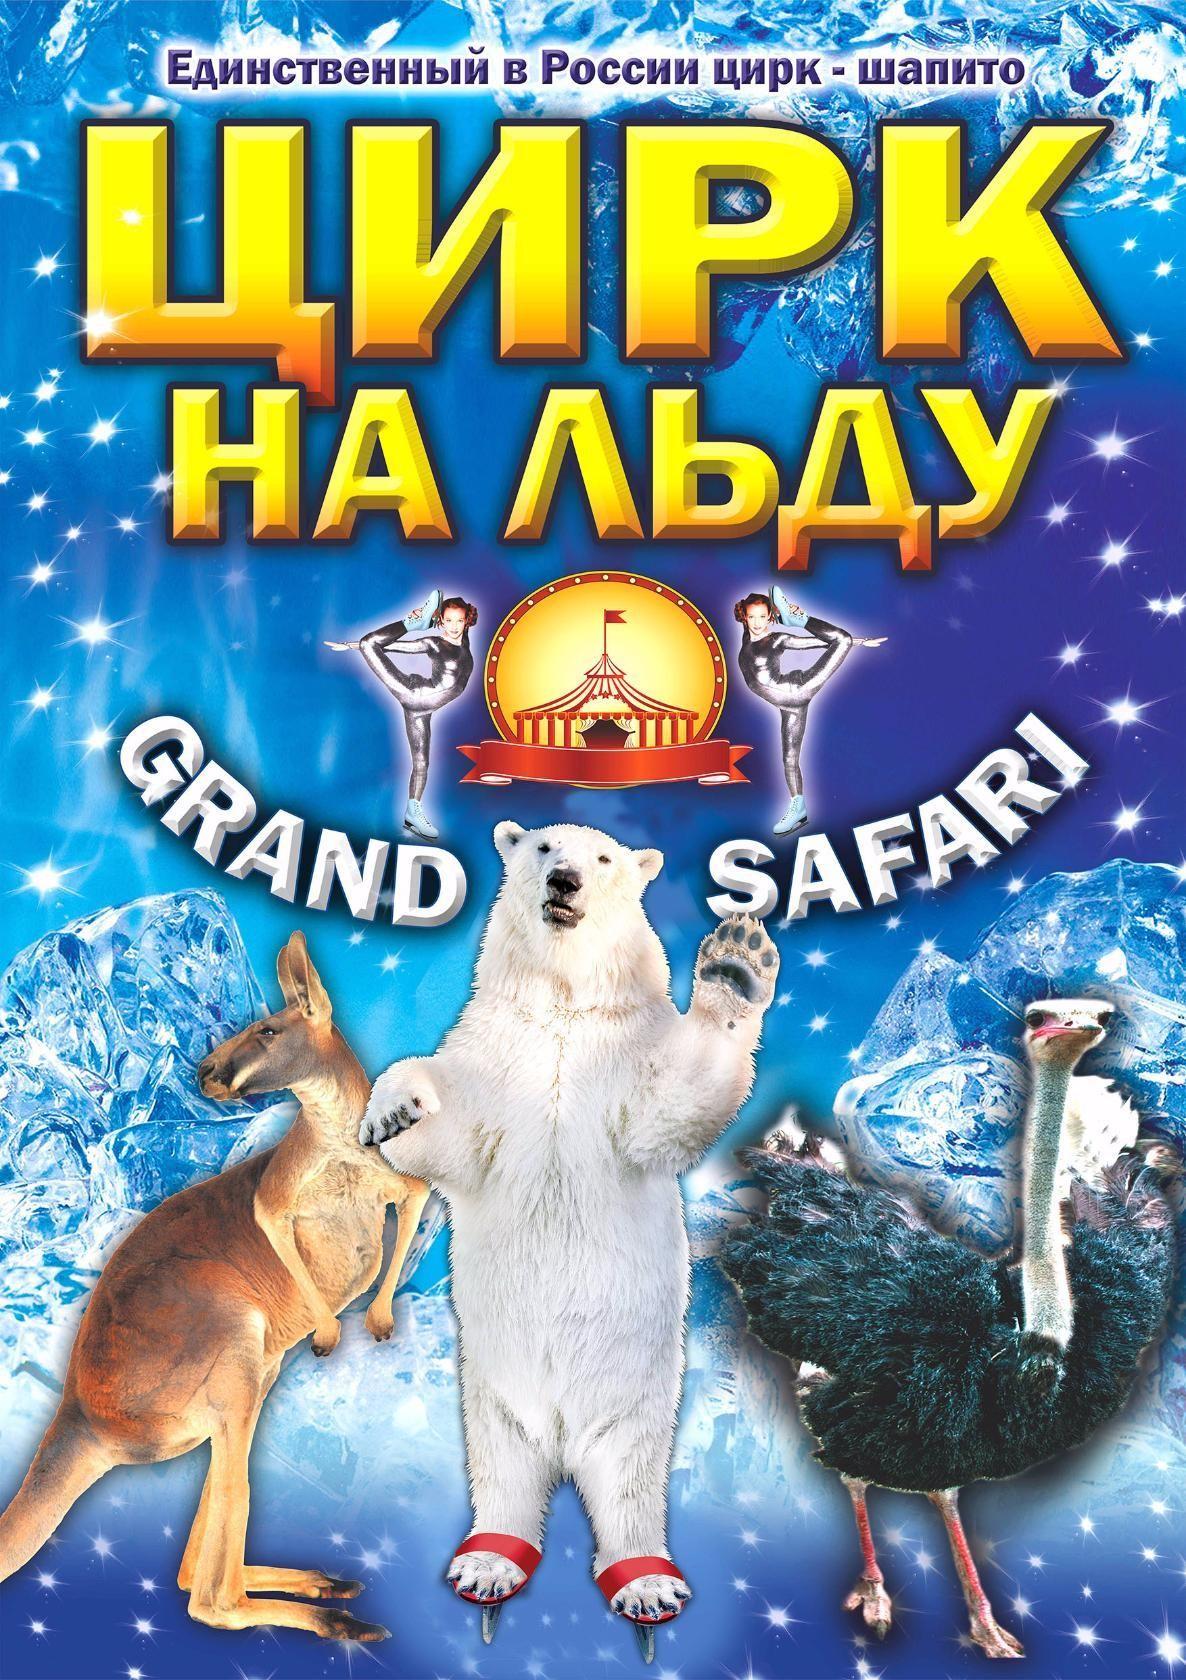 Цирк-шапито на льду «GRAND SAFARI»